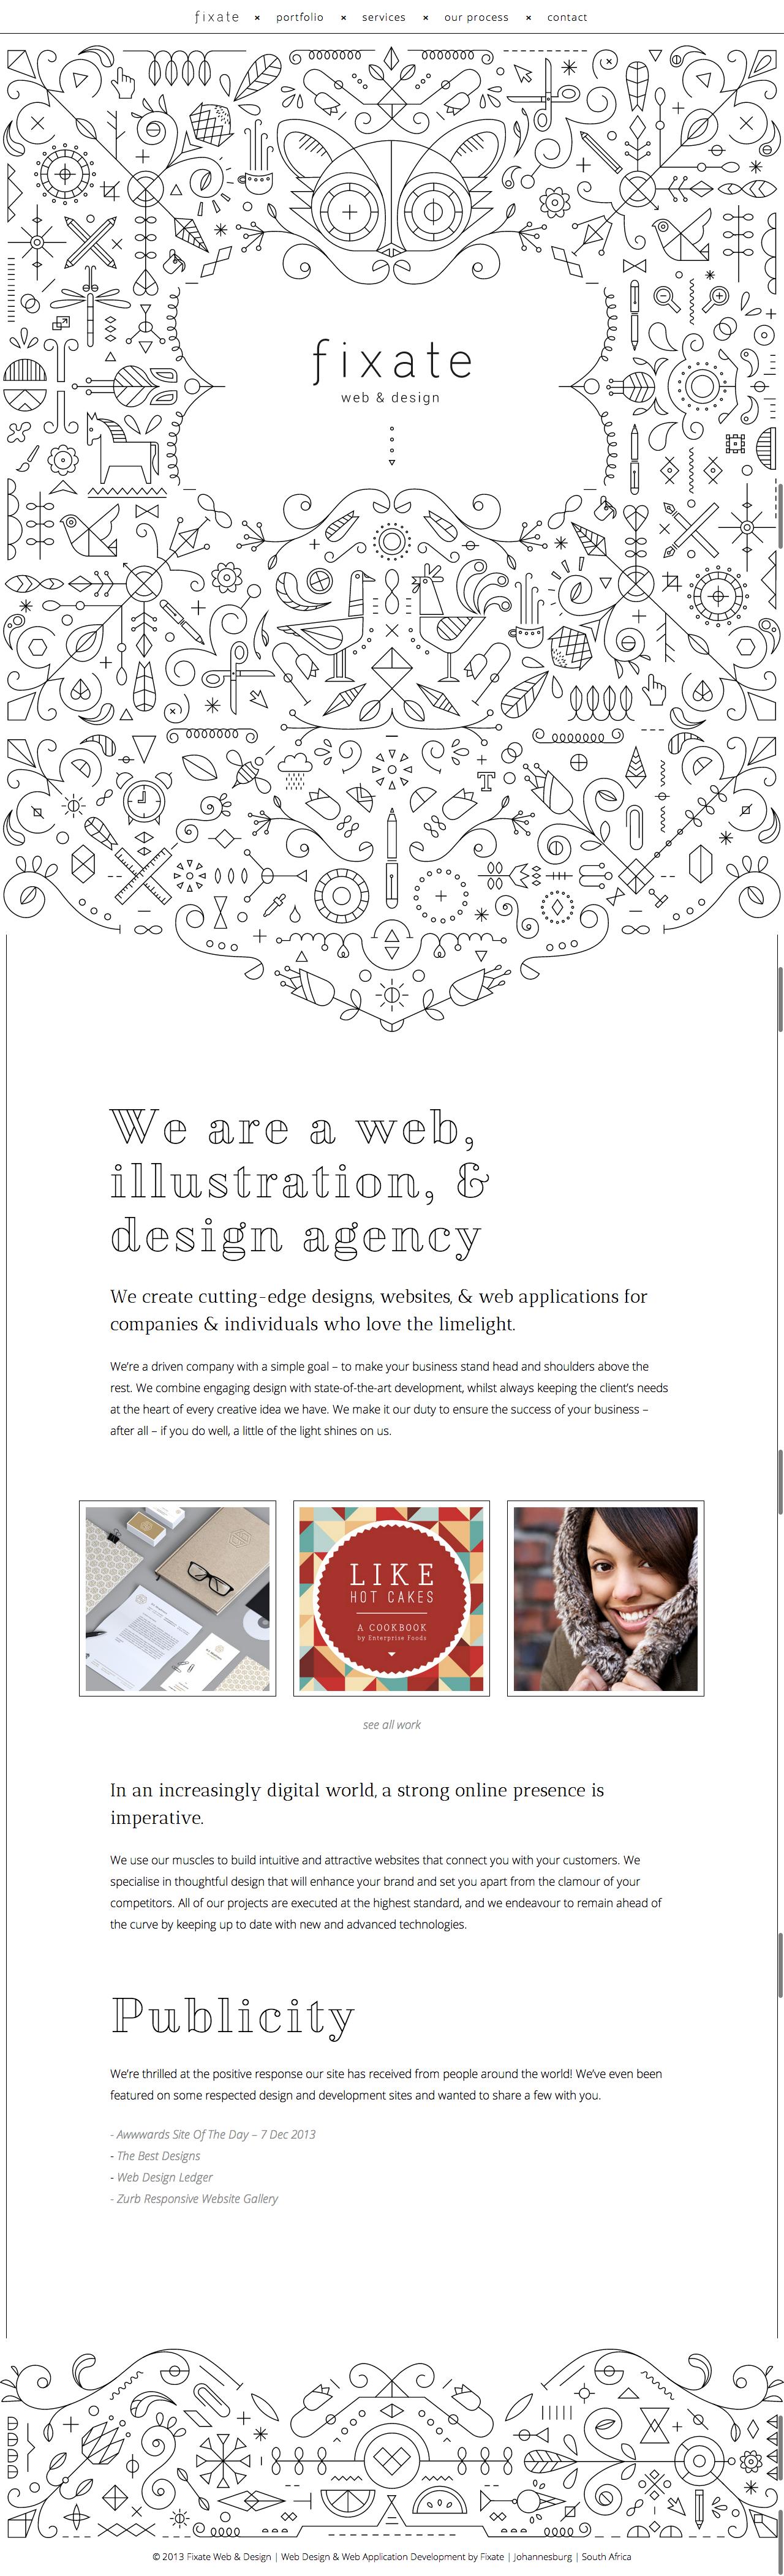 Web Design Agency   SparxITSolutions   India   sparxitsolutions.com